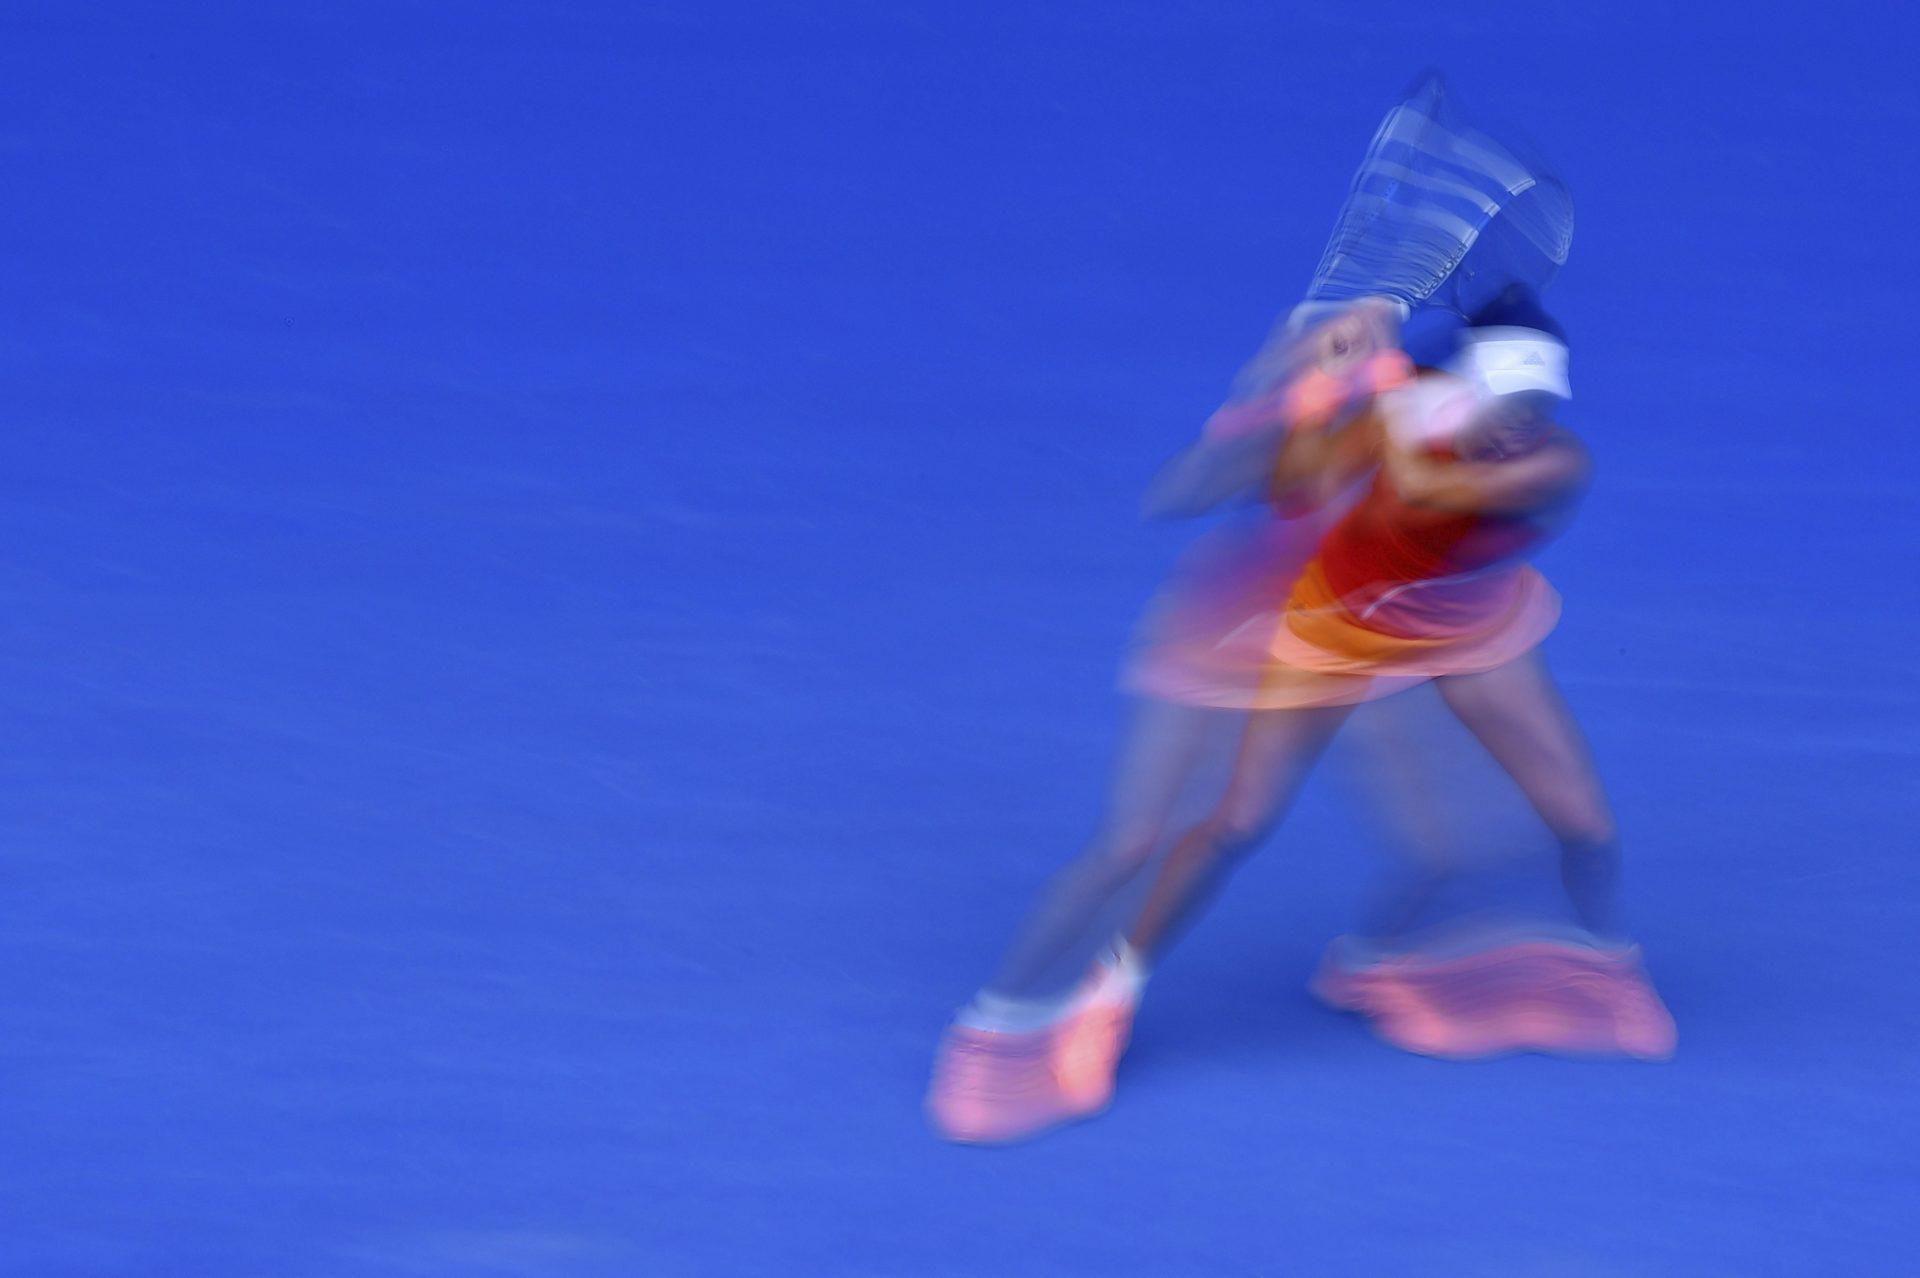 La tenista española Garbine Muguruza devuelve la bola a la belga Kirsten Flipkens durante el partido que enfrentó a ambas en la segunda ronda del Abierto de Australia celebrado en Melbourne (Australia)